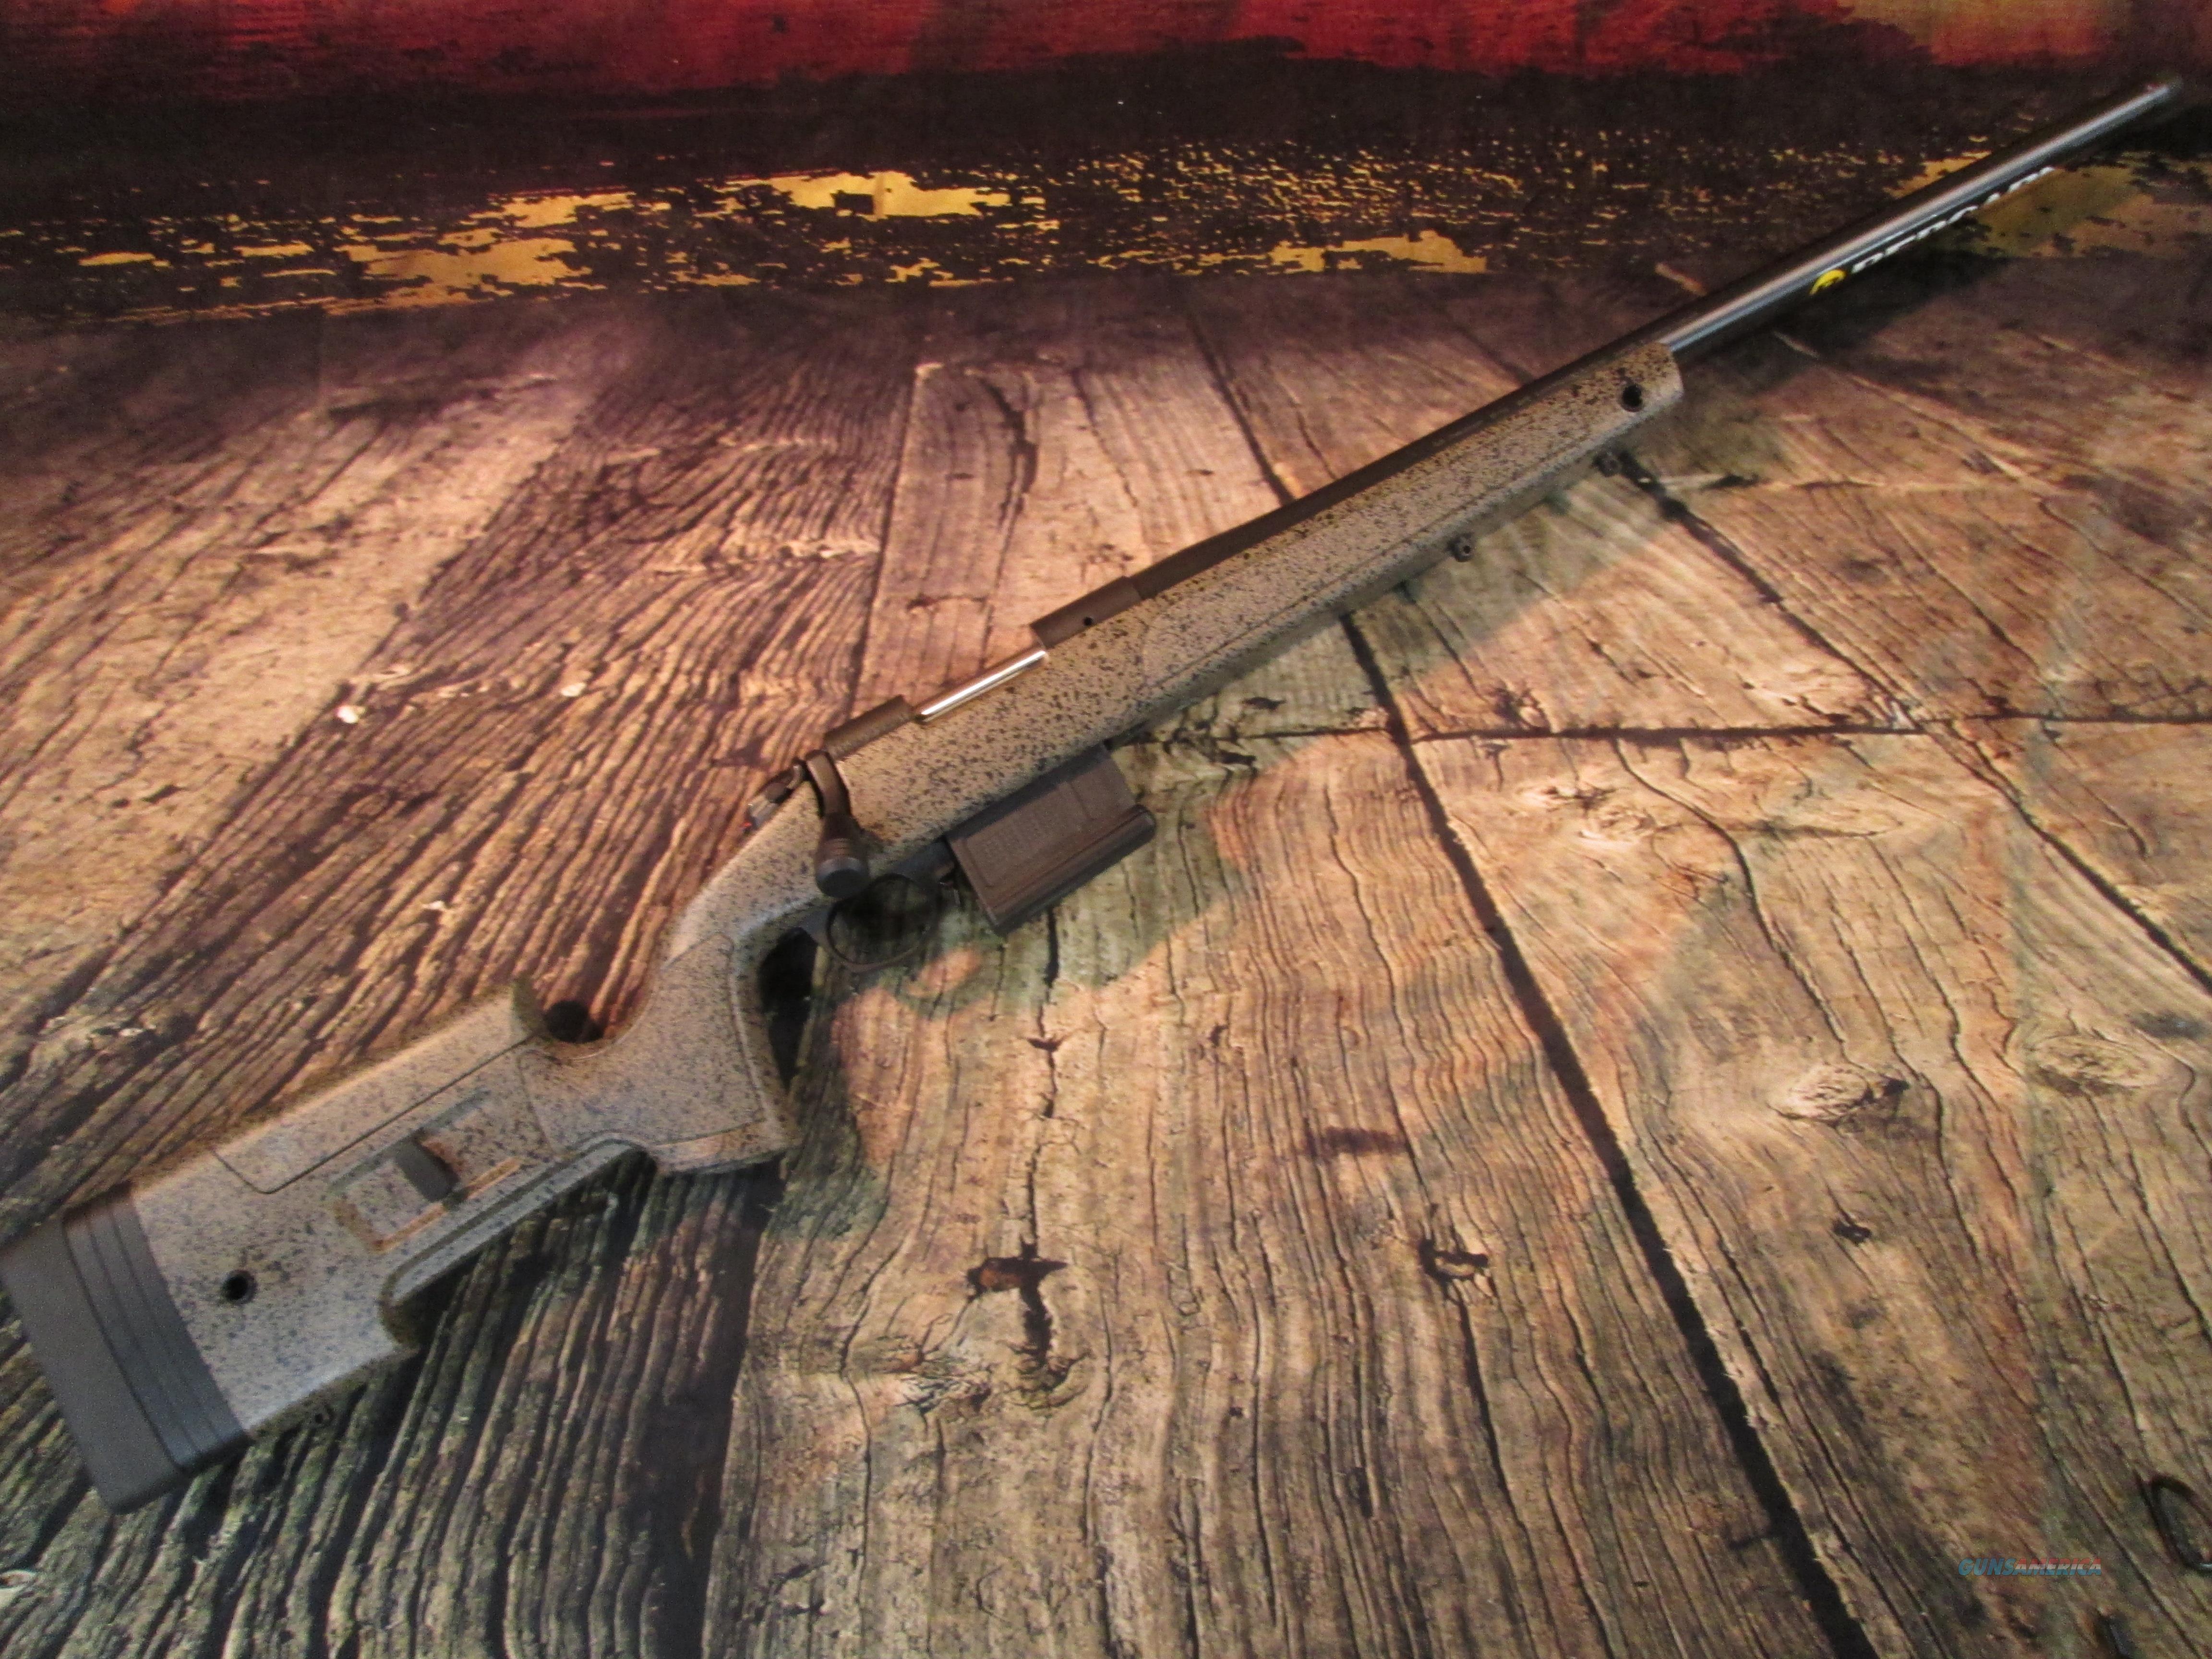 BERGARA B-14 HUNTING & MATCH RIFLE HMR 6.5 CREED (B14S352)  Guns > Rifles > Bergara Rifles